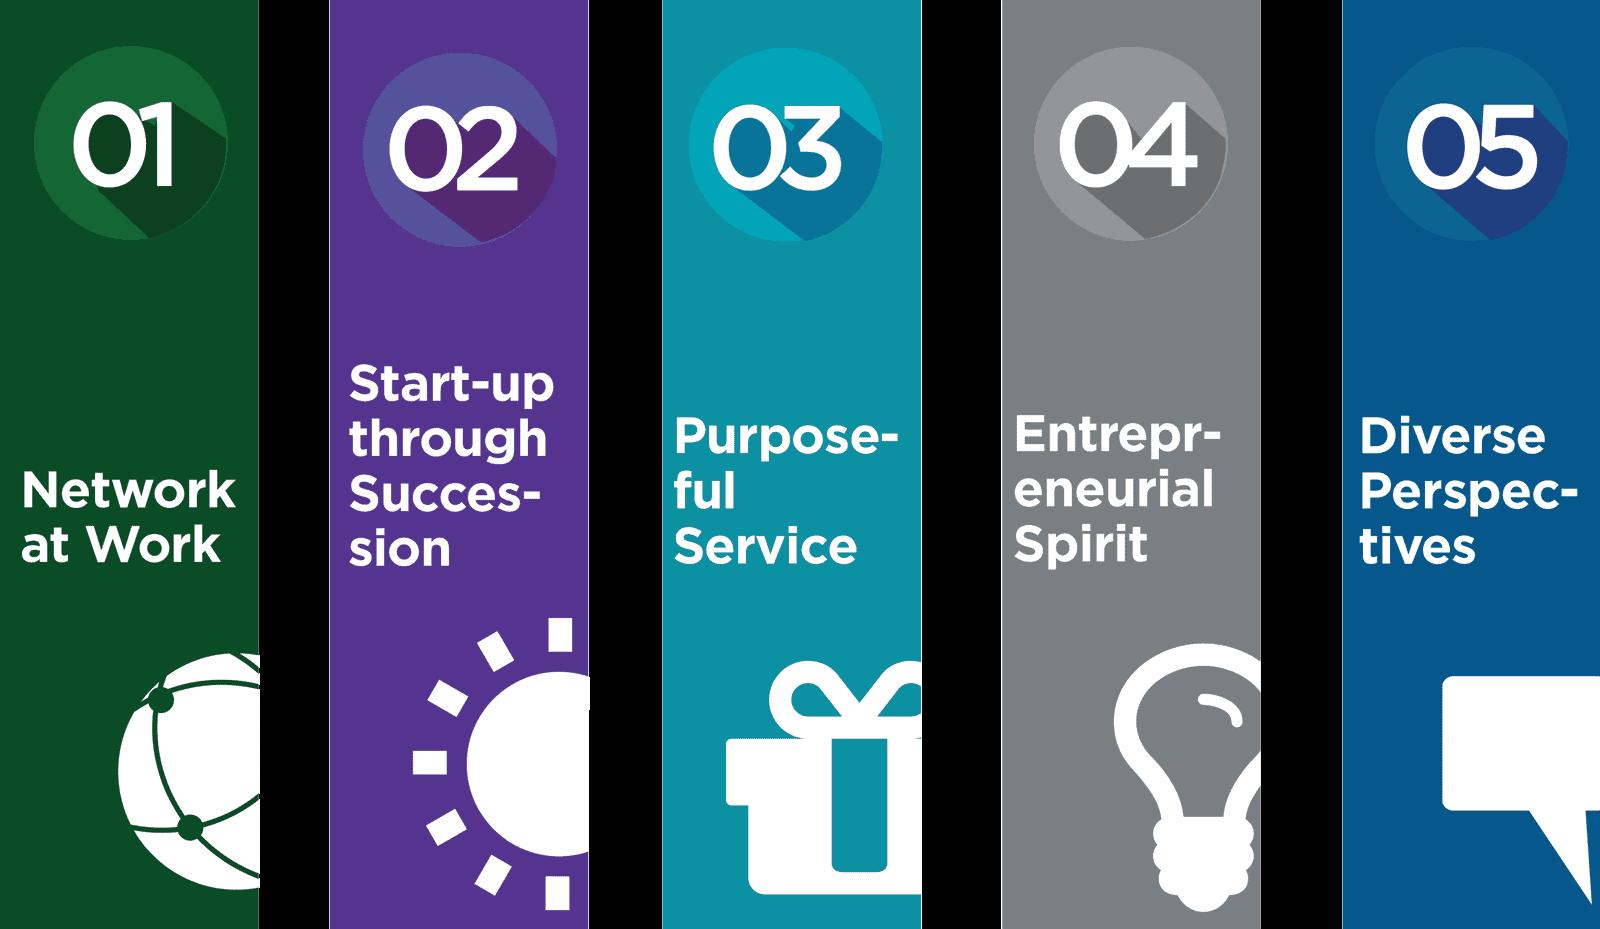 1. Network at work 2. Start-up through success 3. Purposeful Service 4. Entrepreneurial Spirit 5. Diverse Perspective